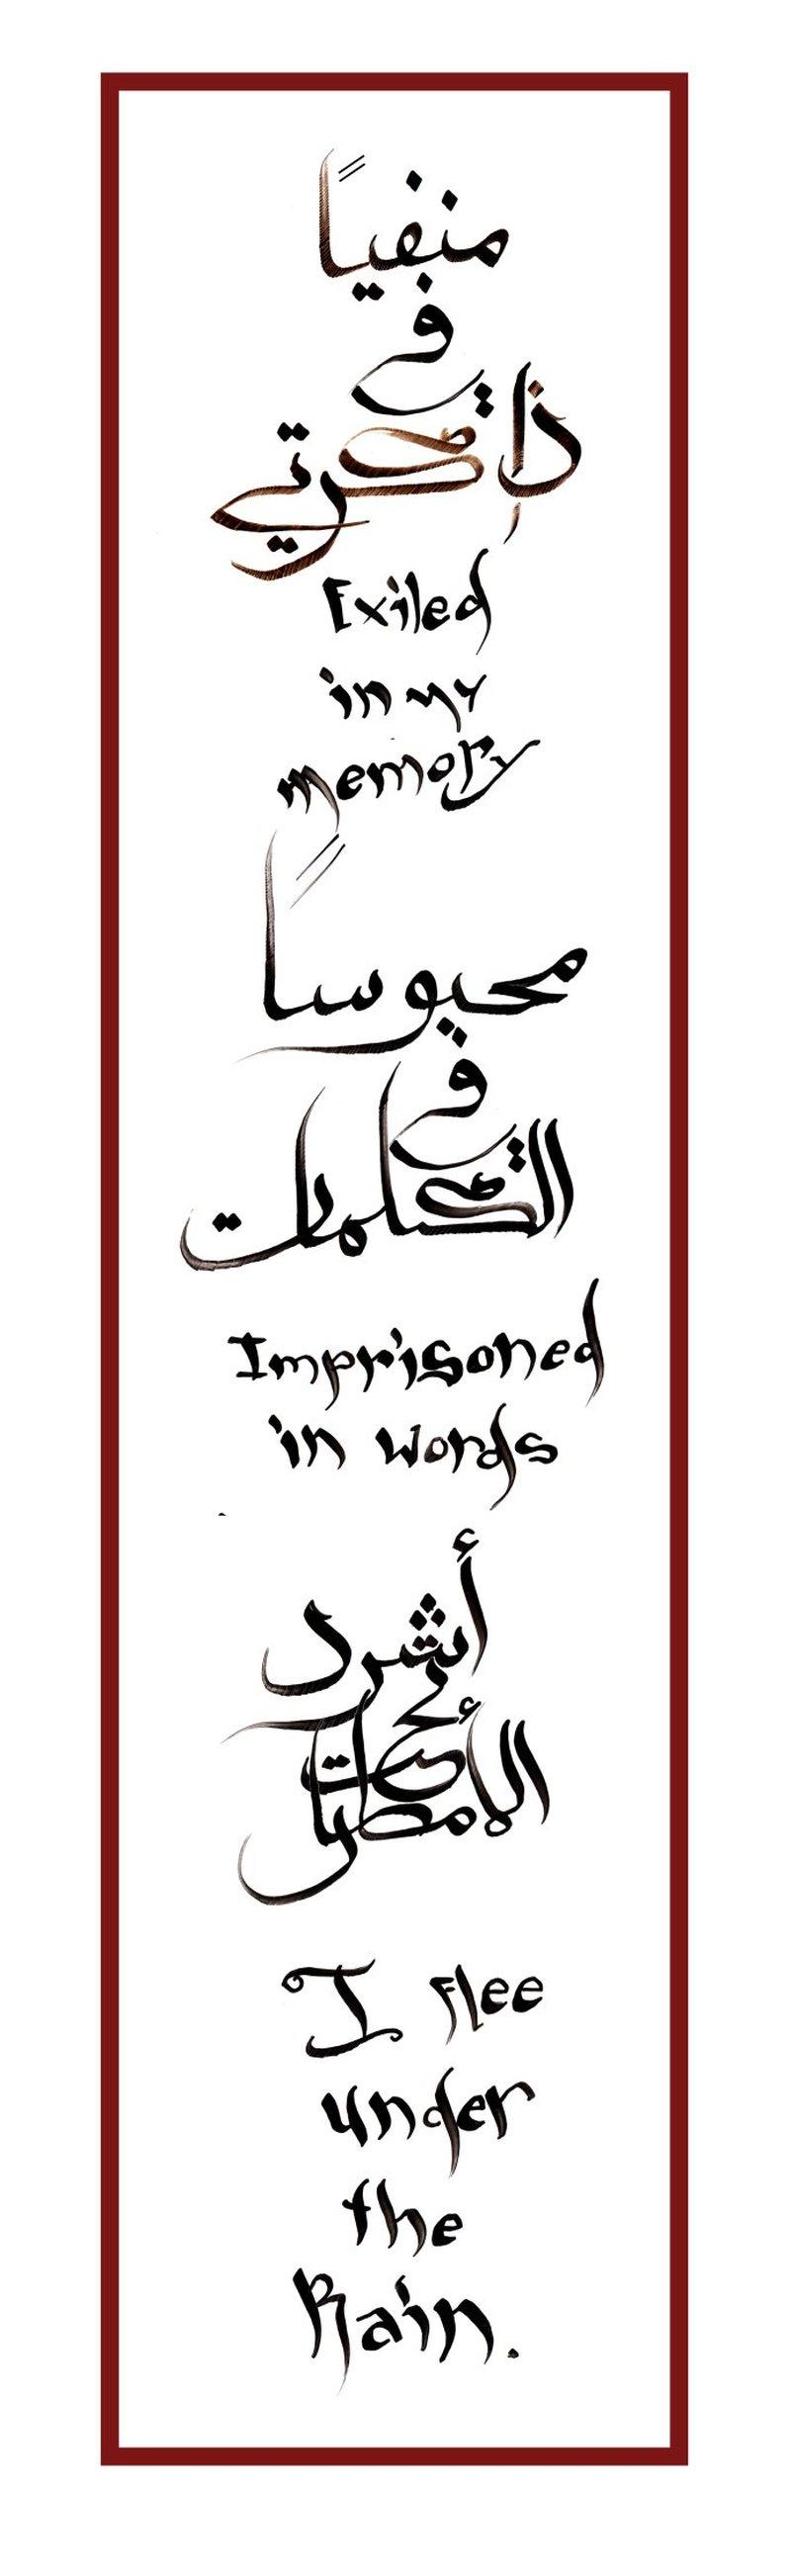 Wonderful arabic wording tattoo design